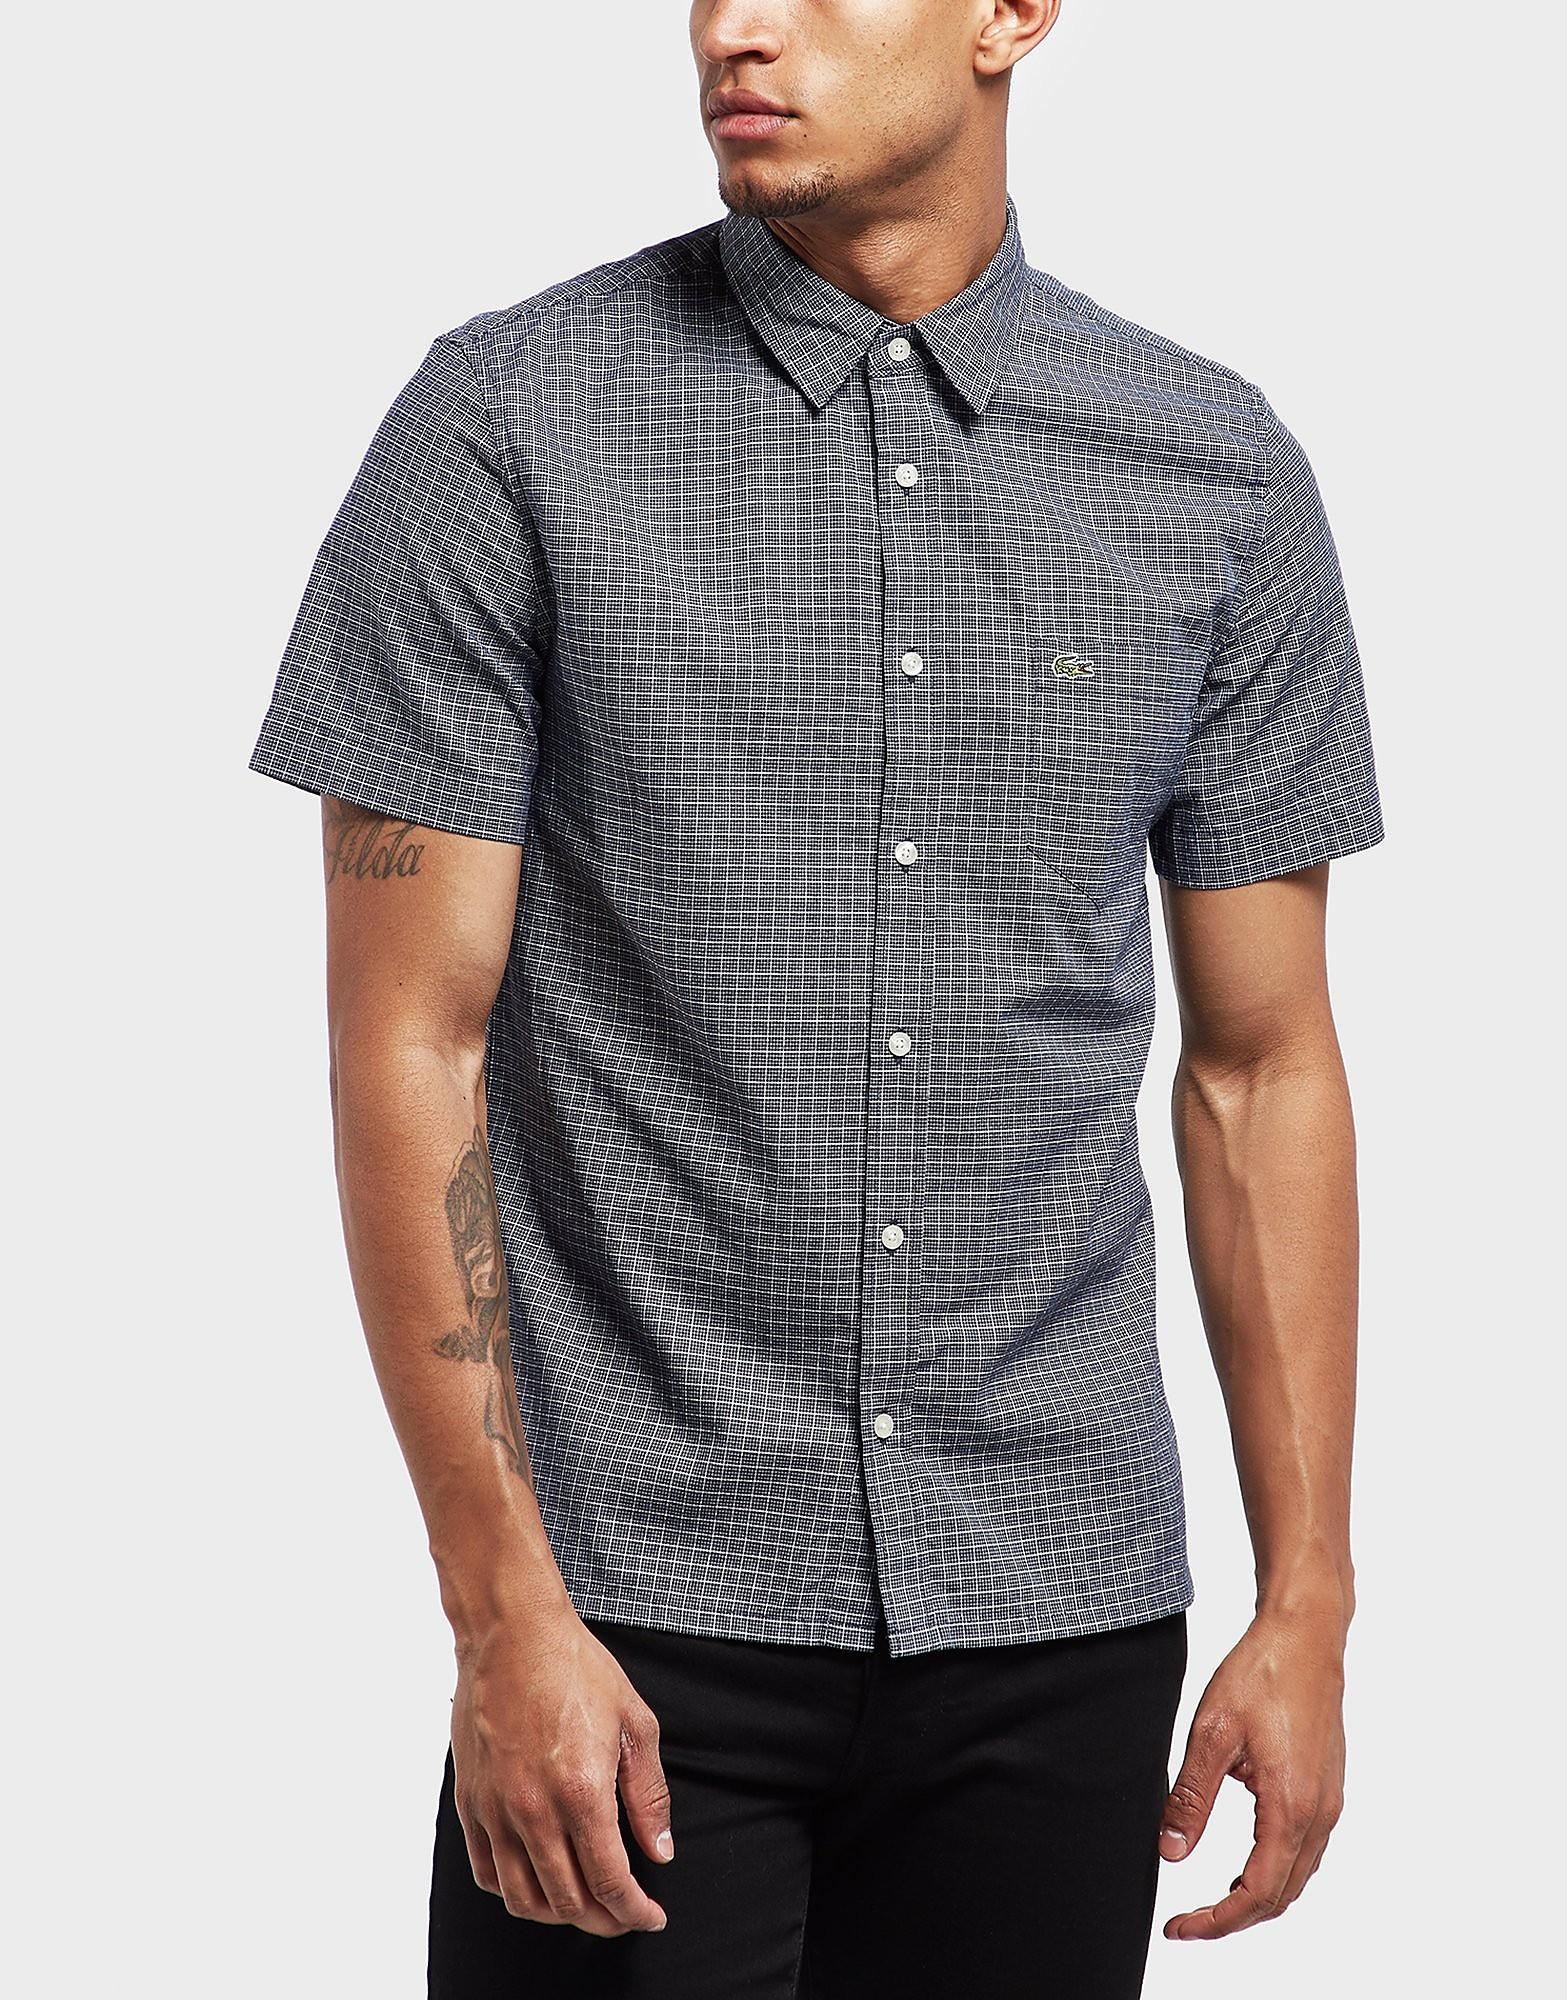 Lacoste Jacquard Poplin Short Sleeve Shirt